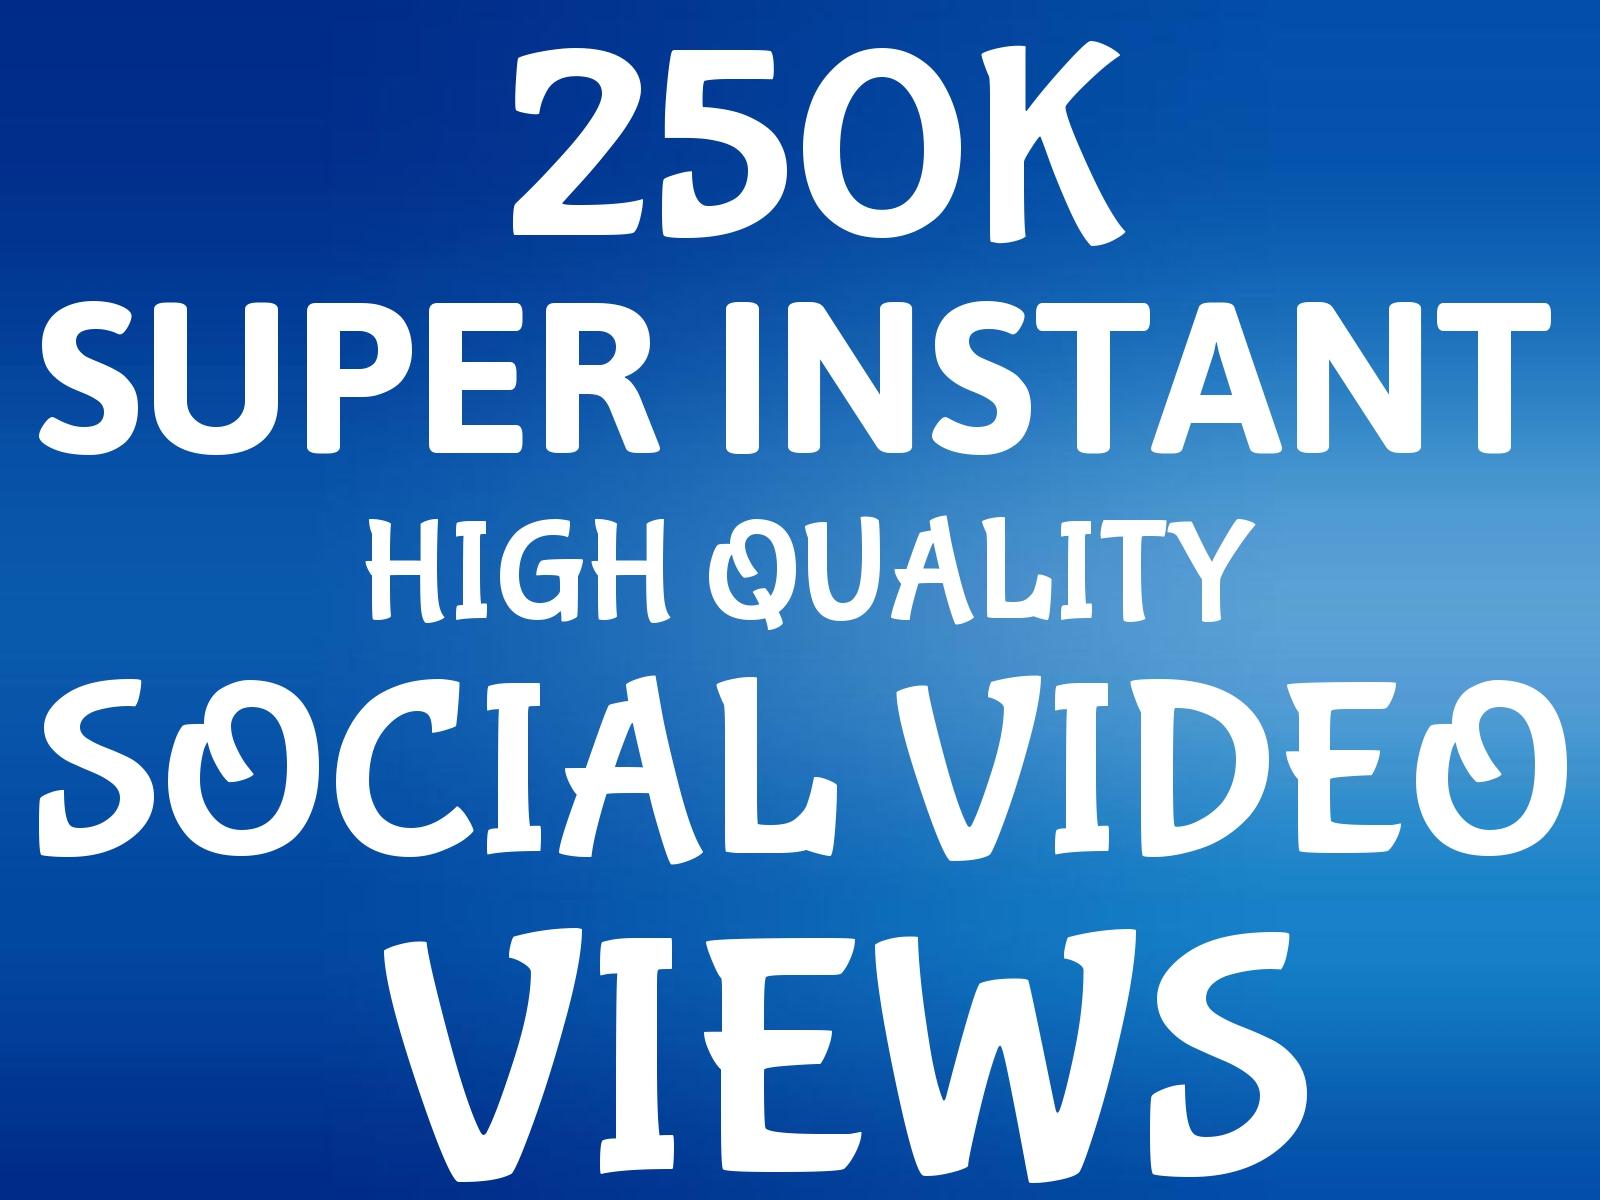 Add Super Instant 250K HQ Video Views